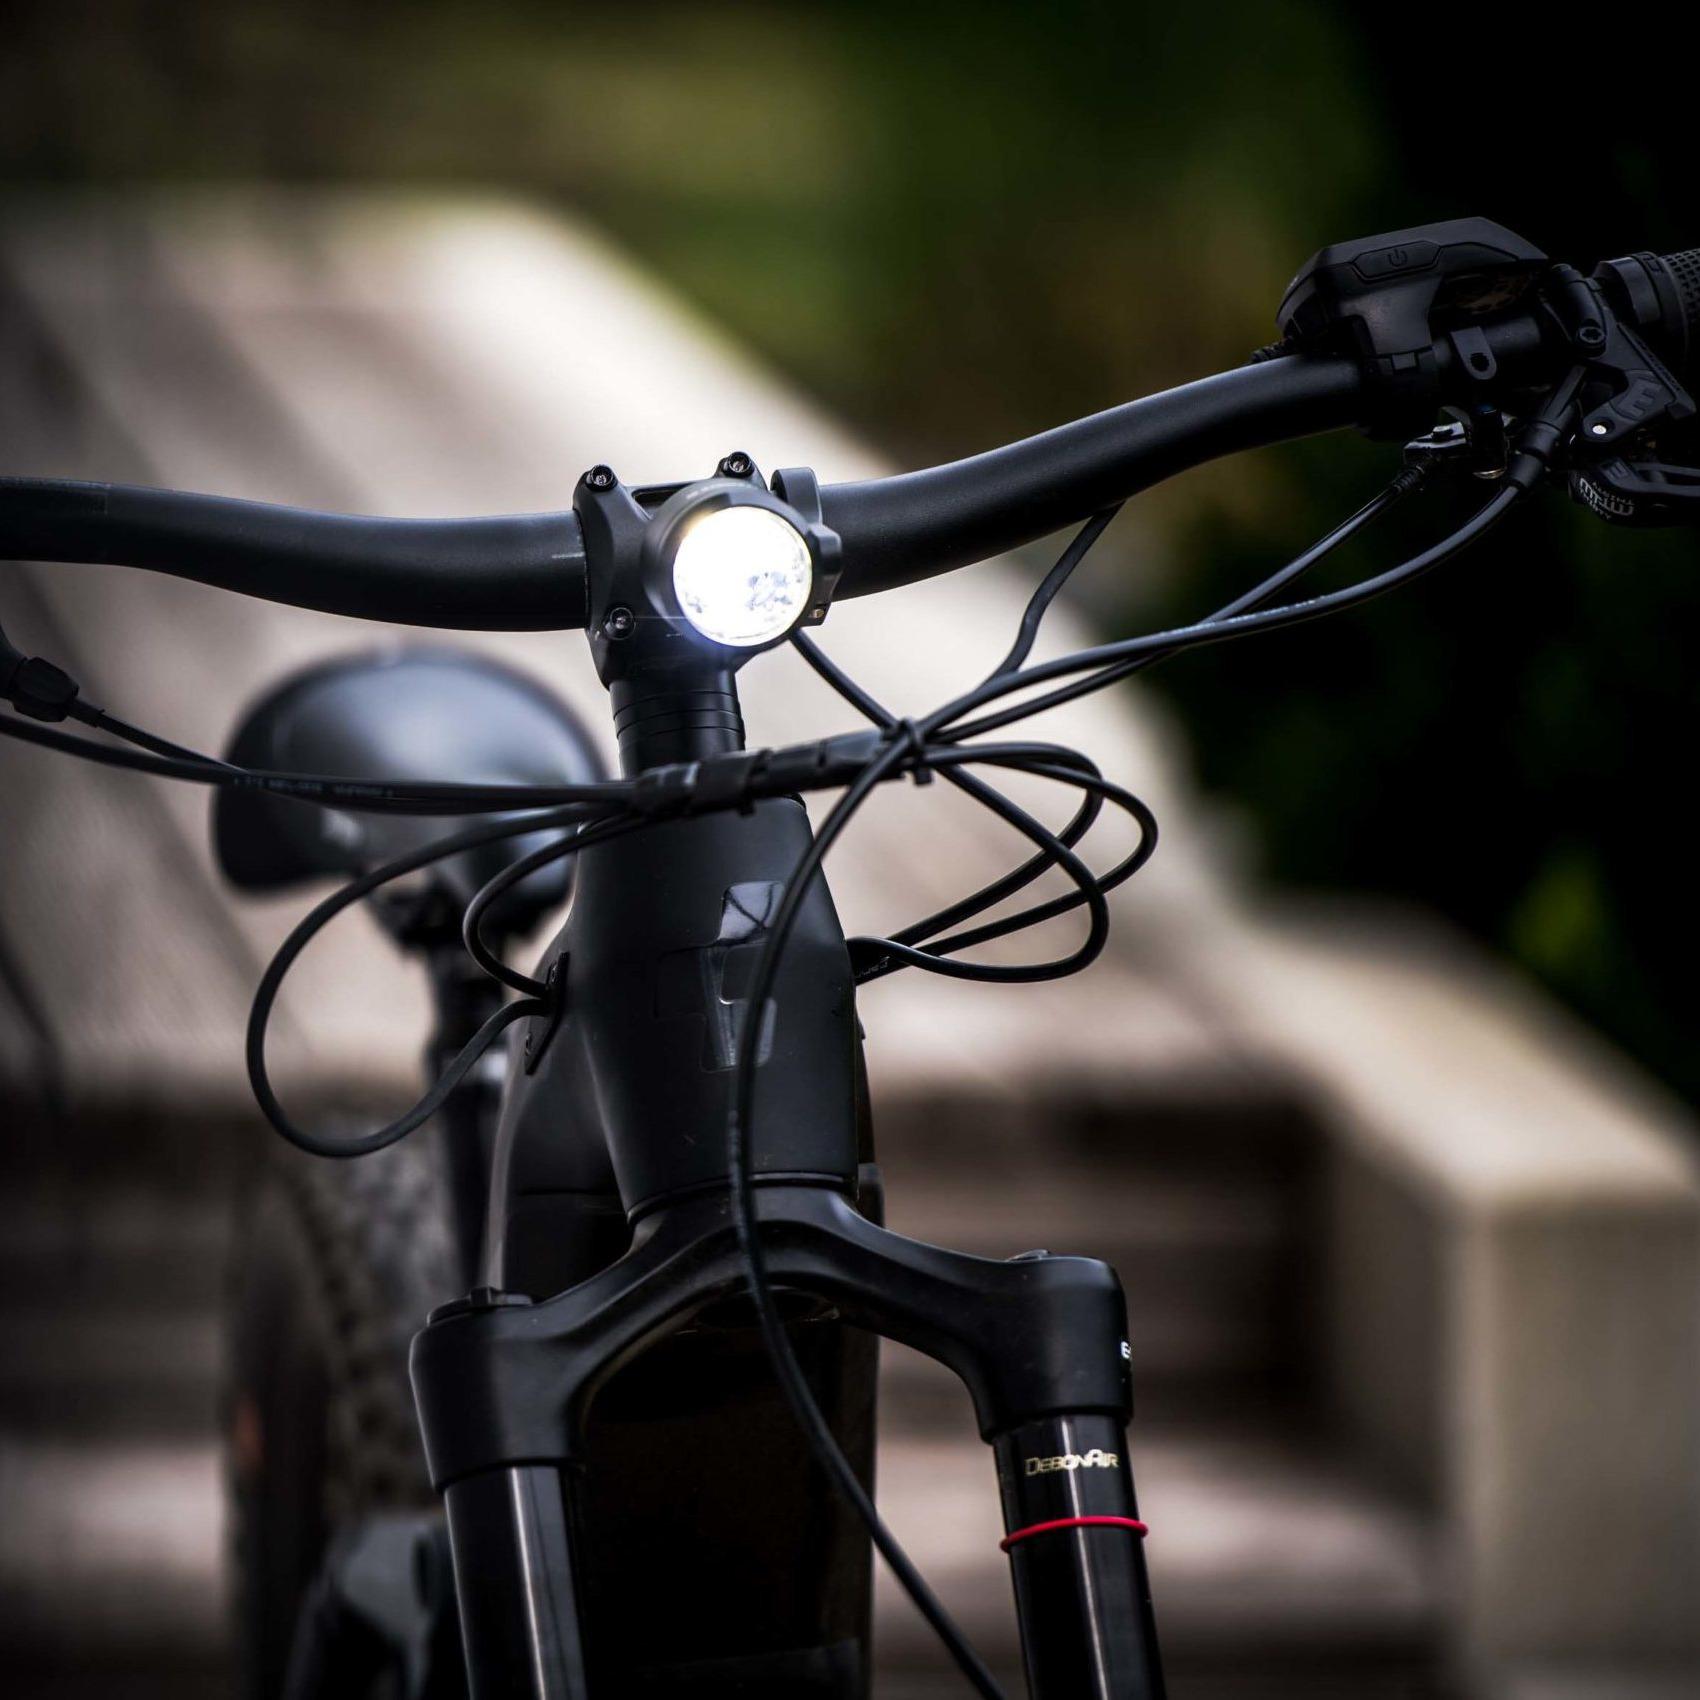 Image of Litemove SE-110 LED Front Light for E-Bikes - HKSE110D - with reflector